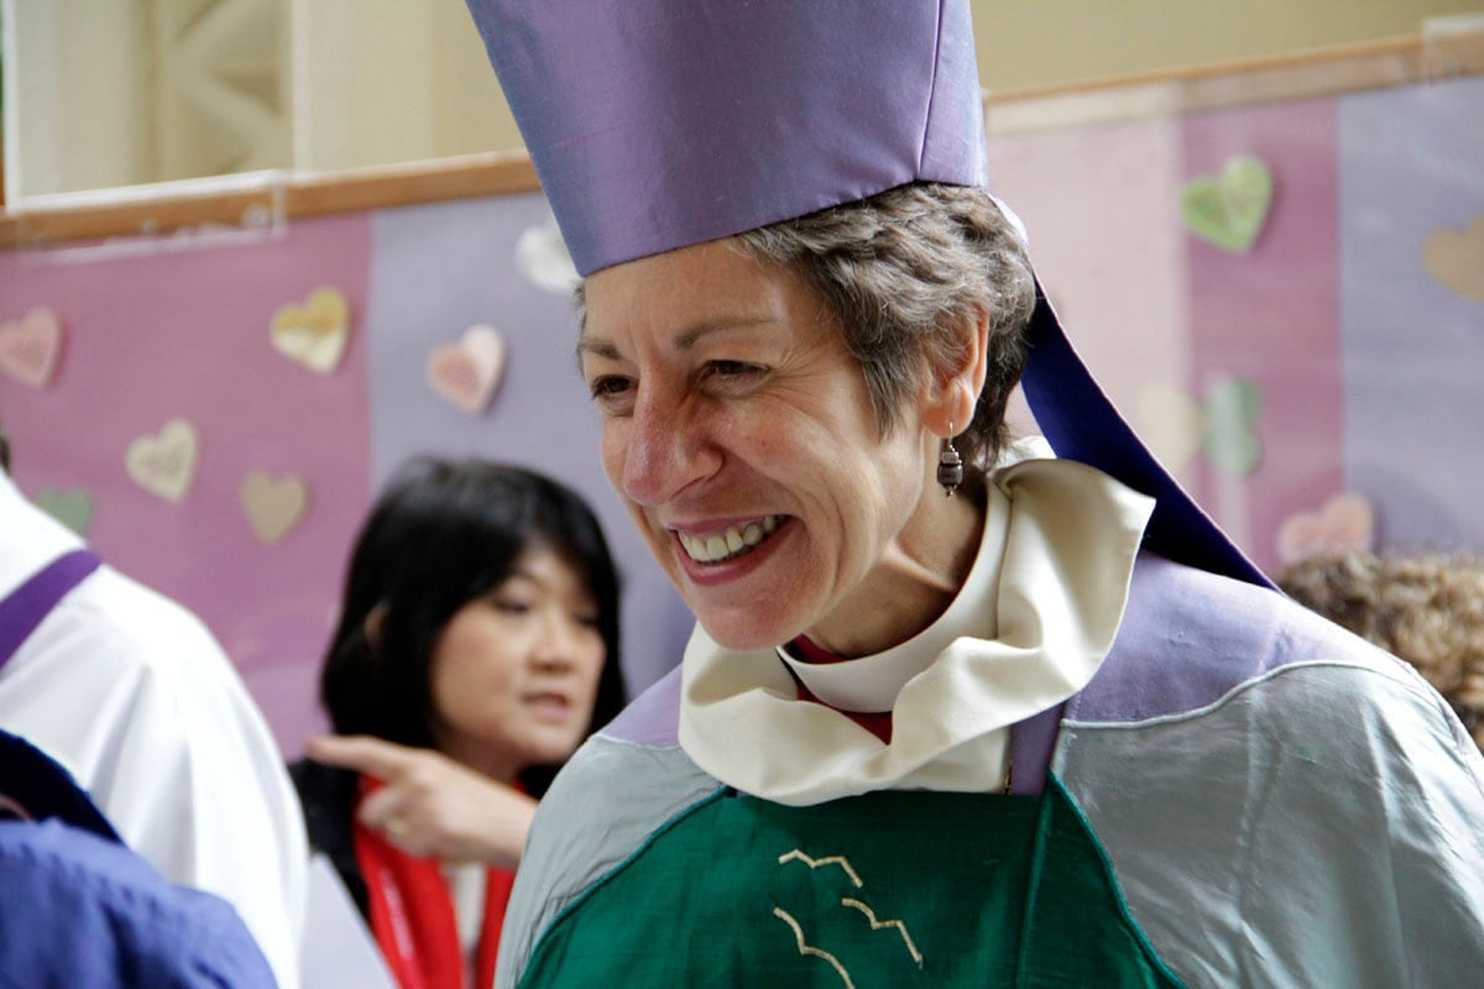 Rev. Dr. Schori